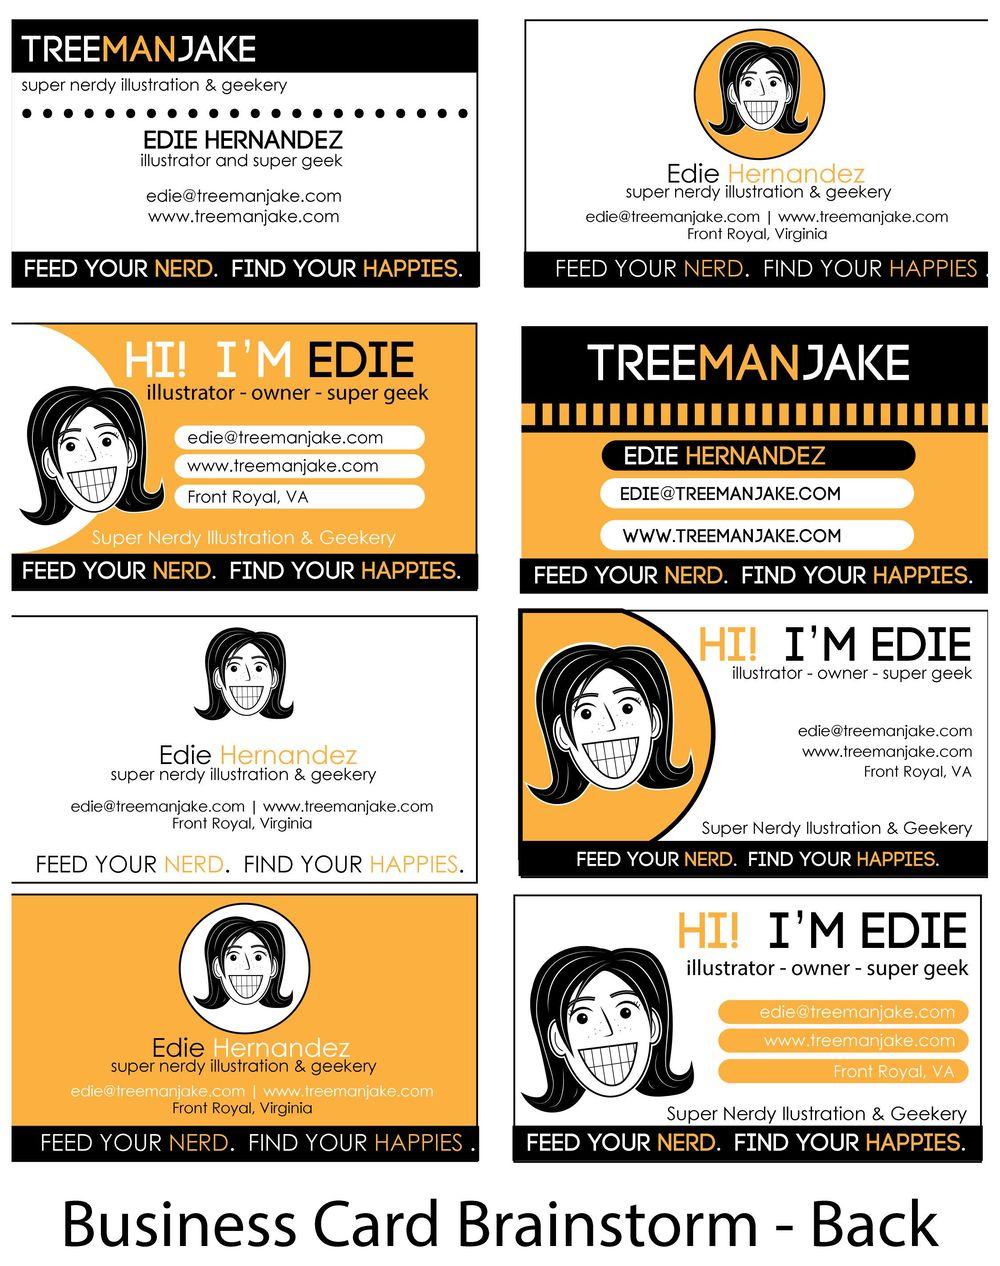 treemanJAKE Business Card - image 10 - student project